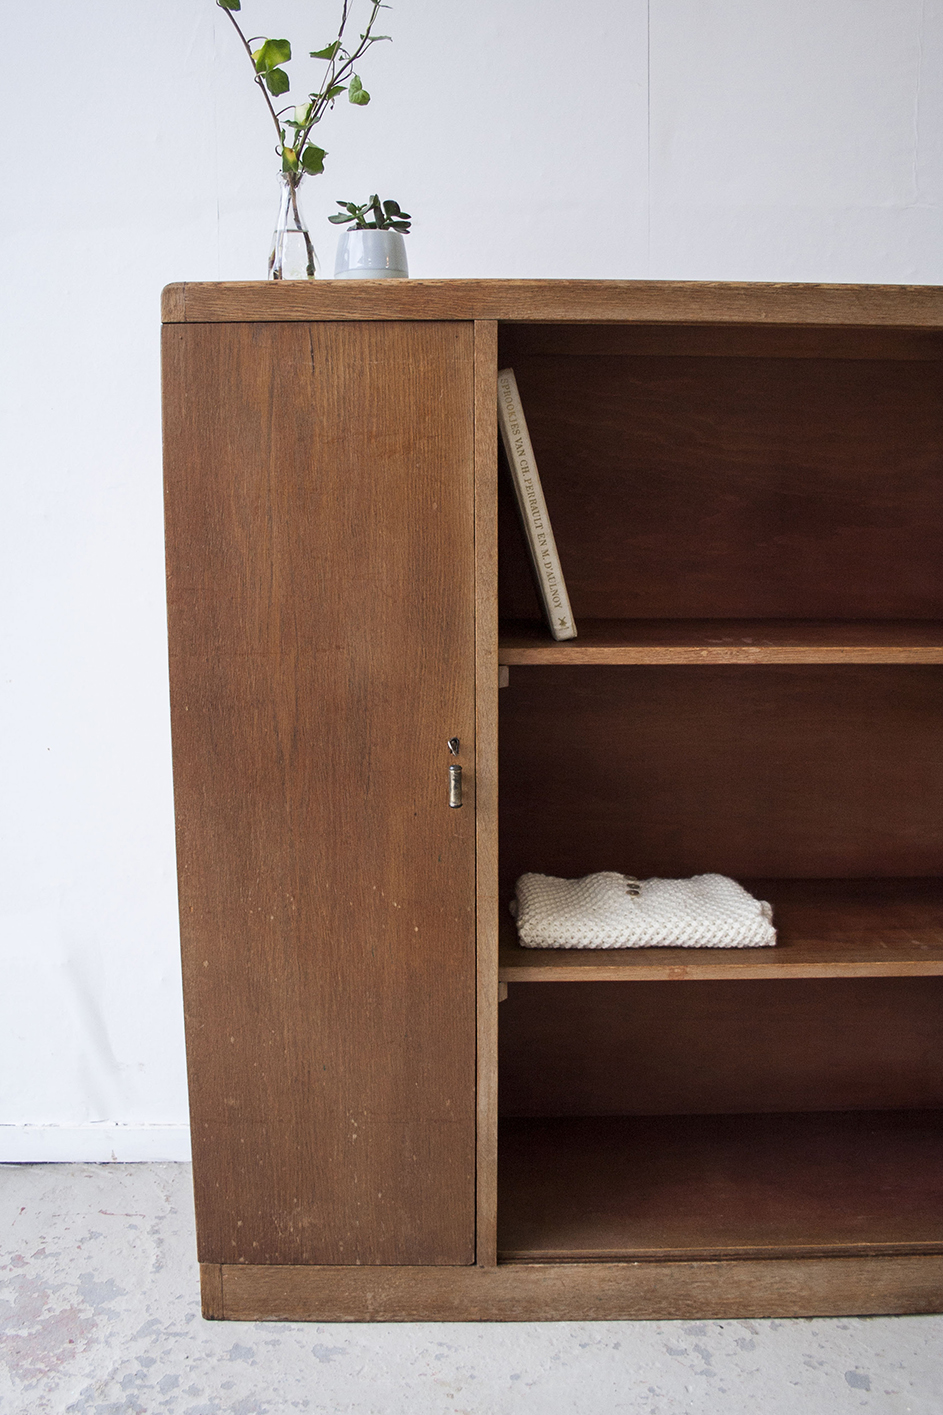 Vintage open kast van hout - Firmazoethout_4.jpg